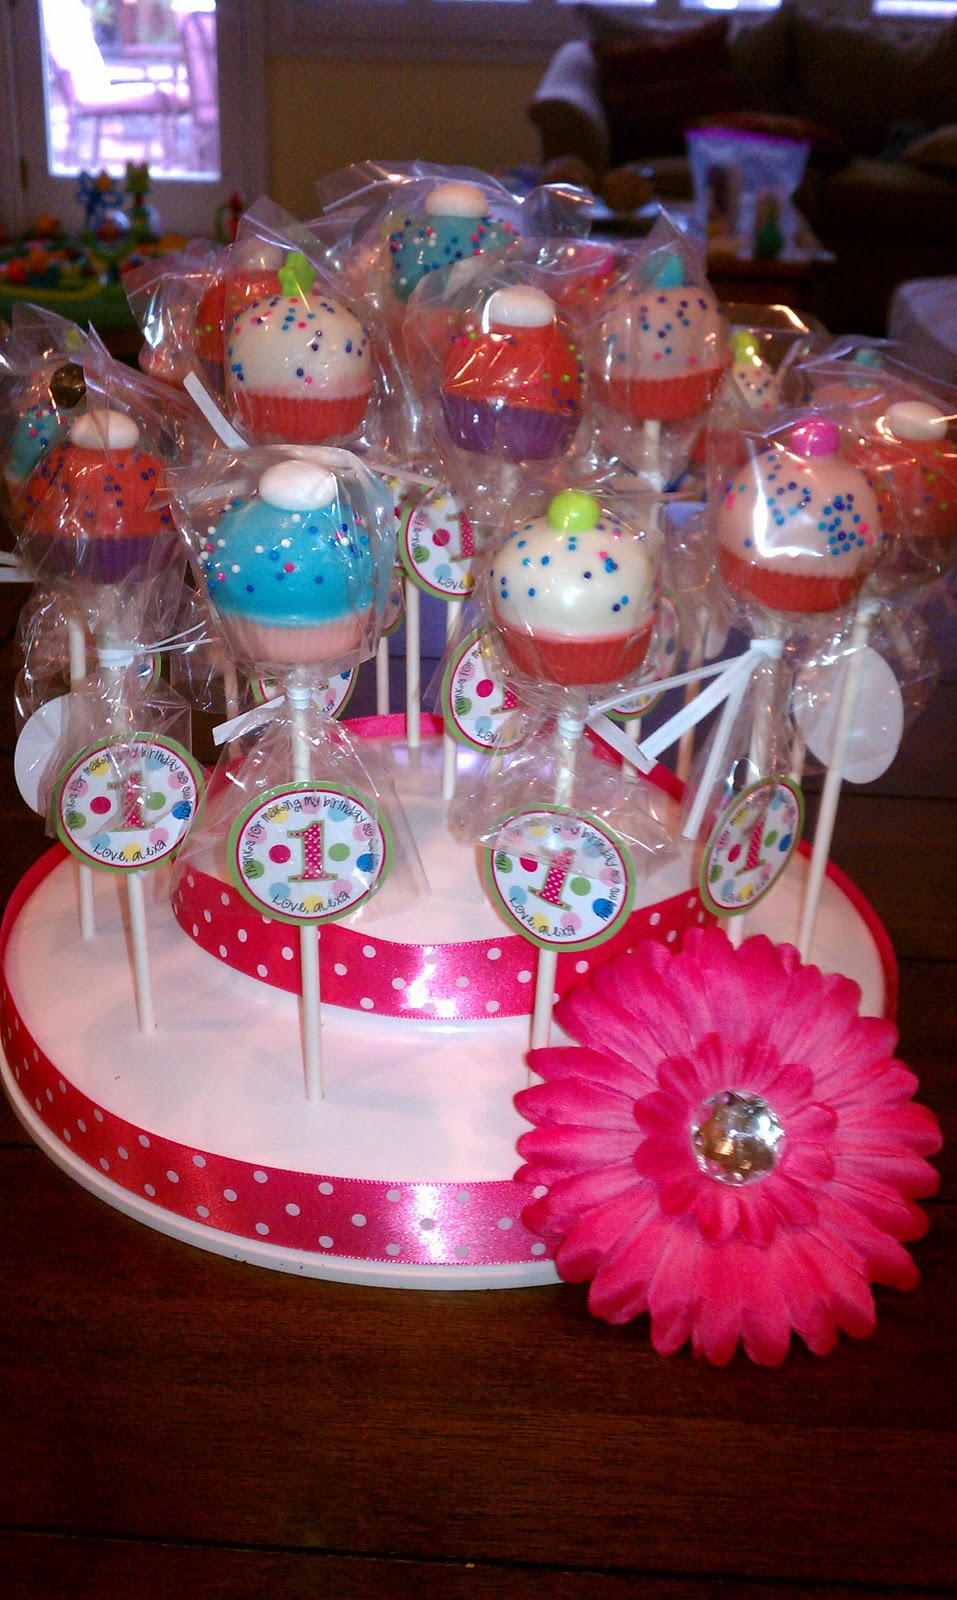 Natalie S Cake Pops Natalie S Party Cake Pops